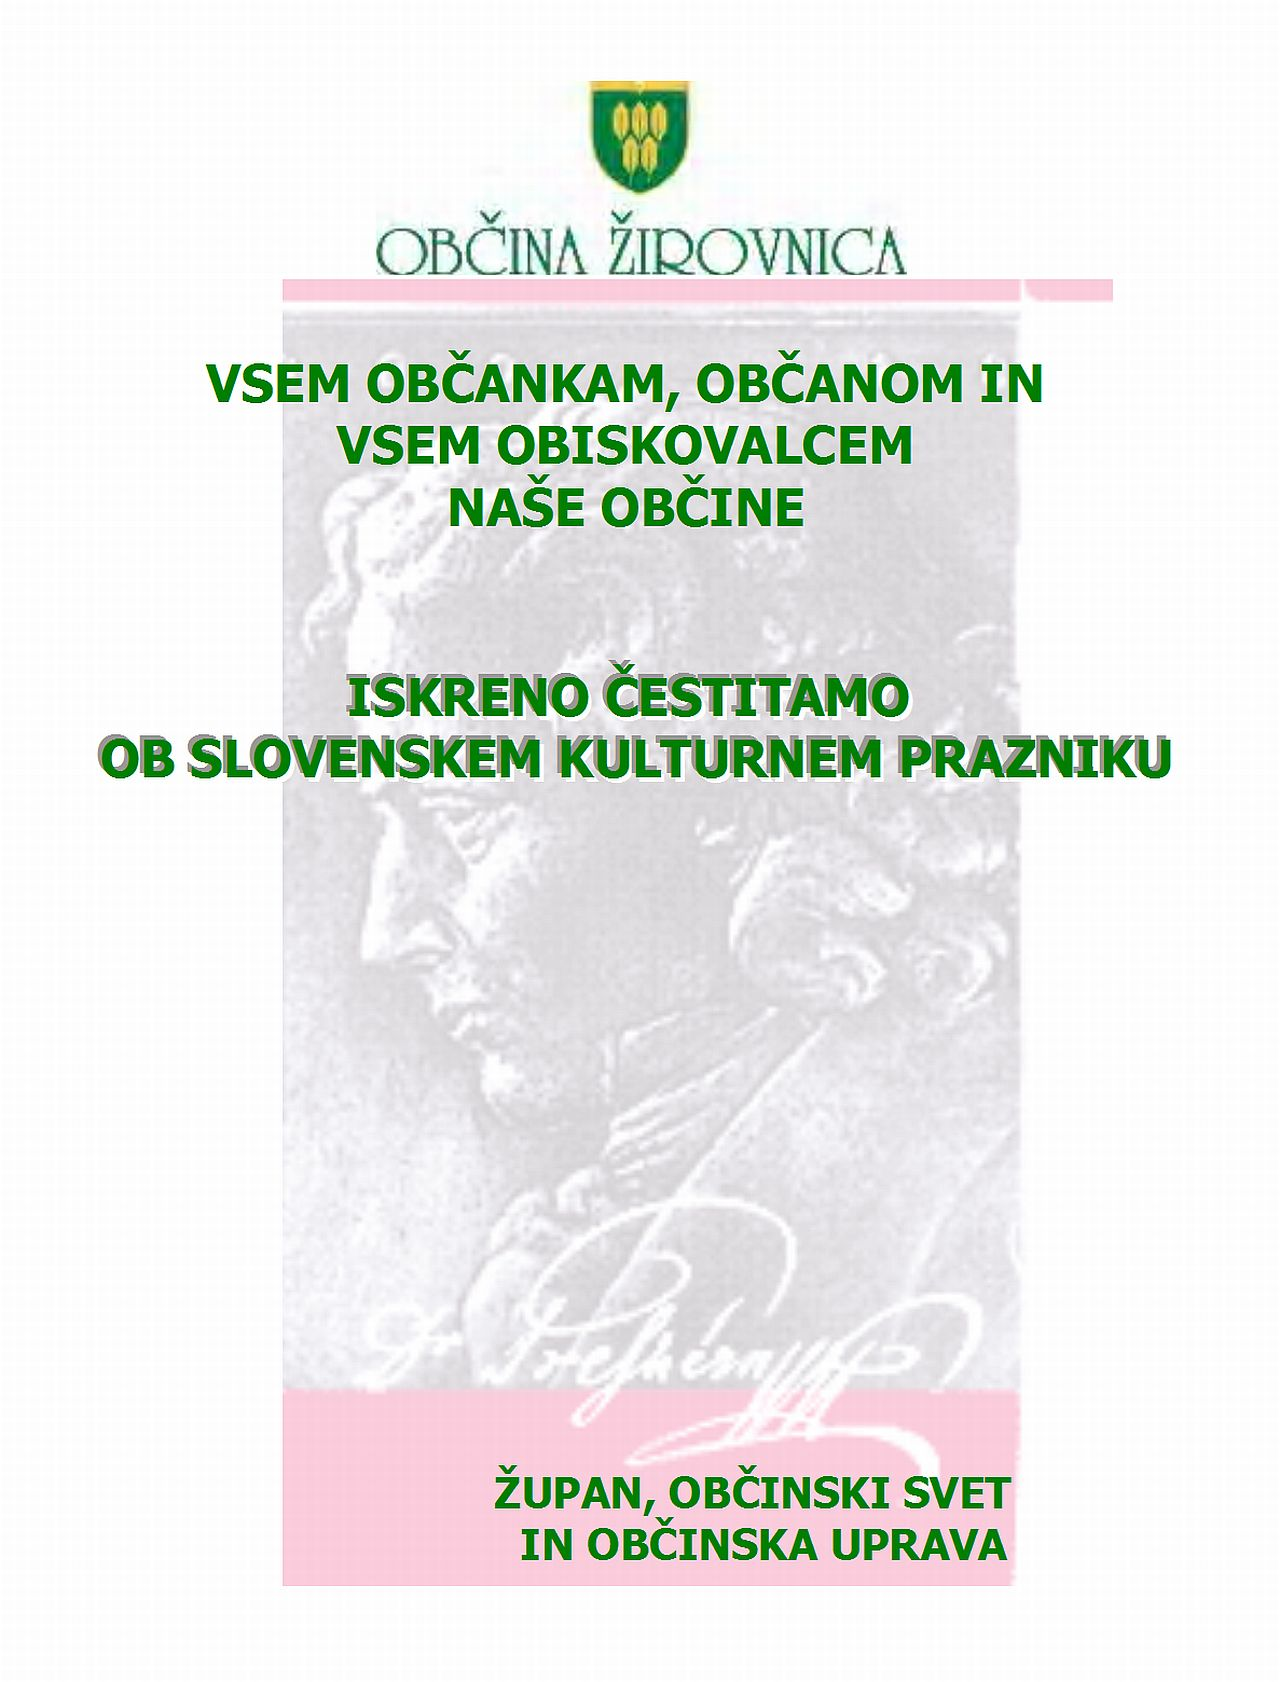 CESTITKA-8 FEBRUAR (3)